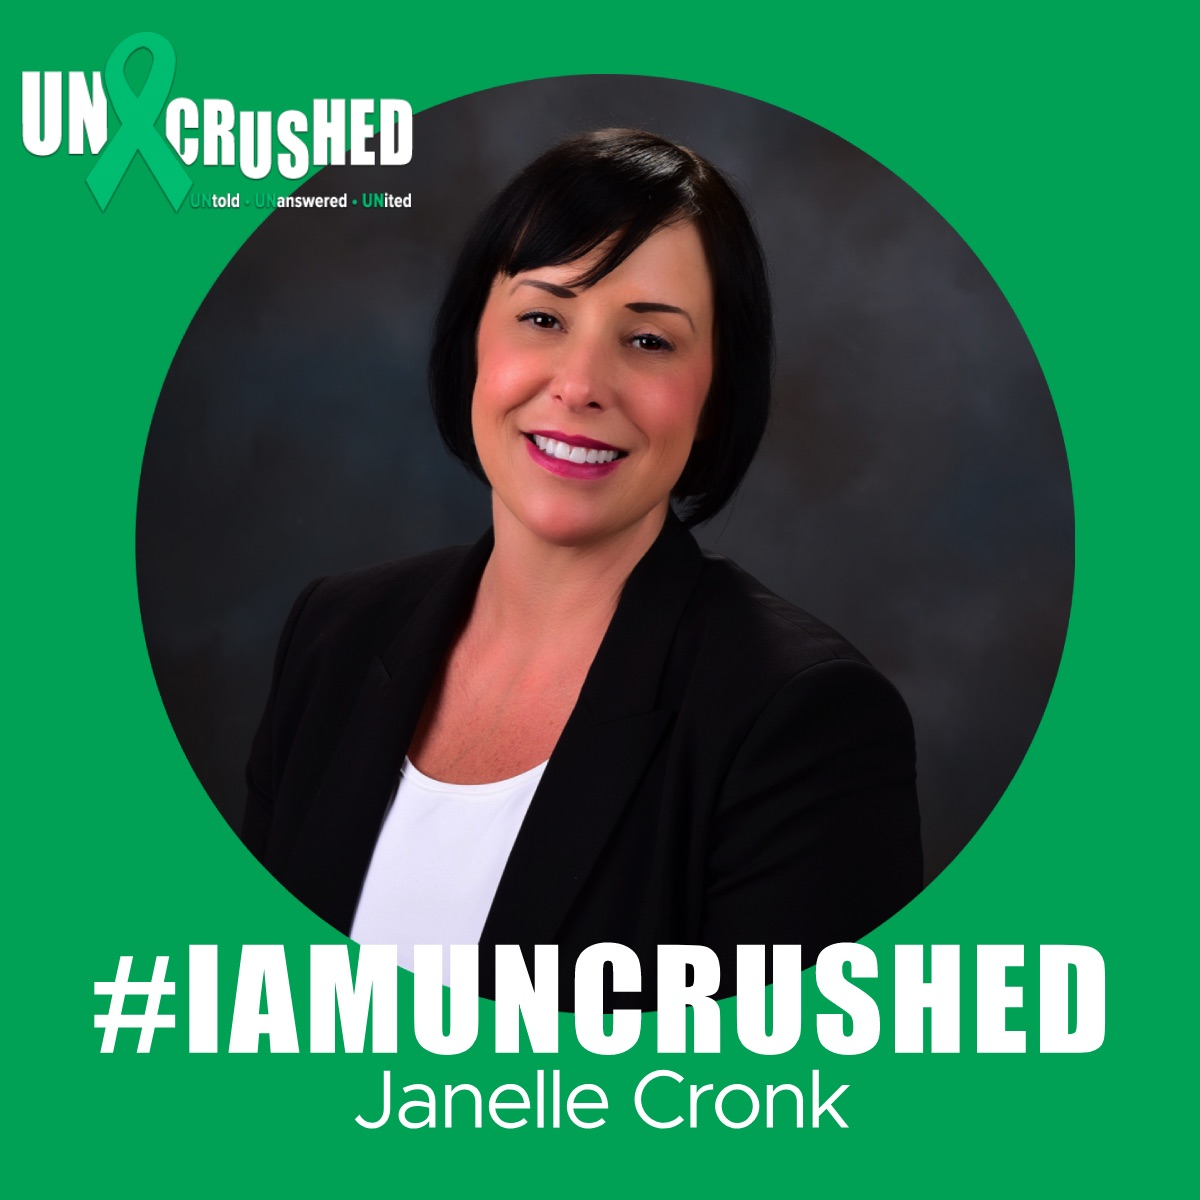 JANELLE CRONK | HEAD OF PARTNERSHIPS & FUNDRAISING | CO-FOUNDER